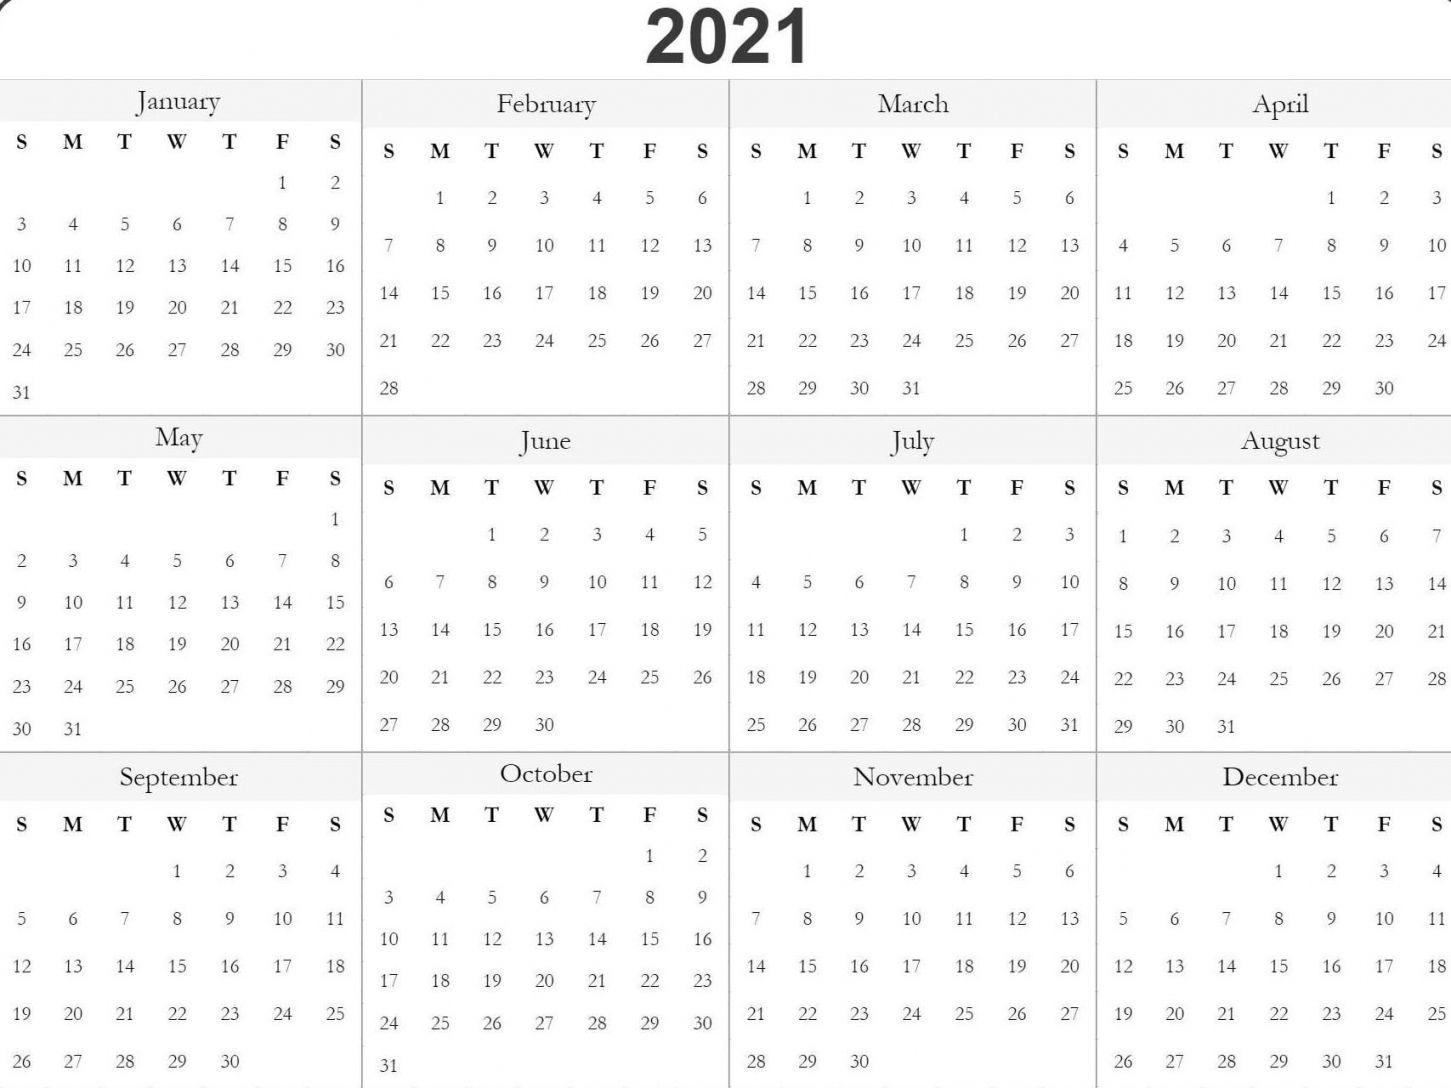 Take Julian Date 2021